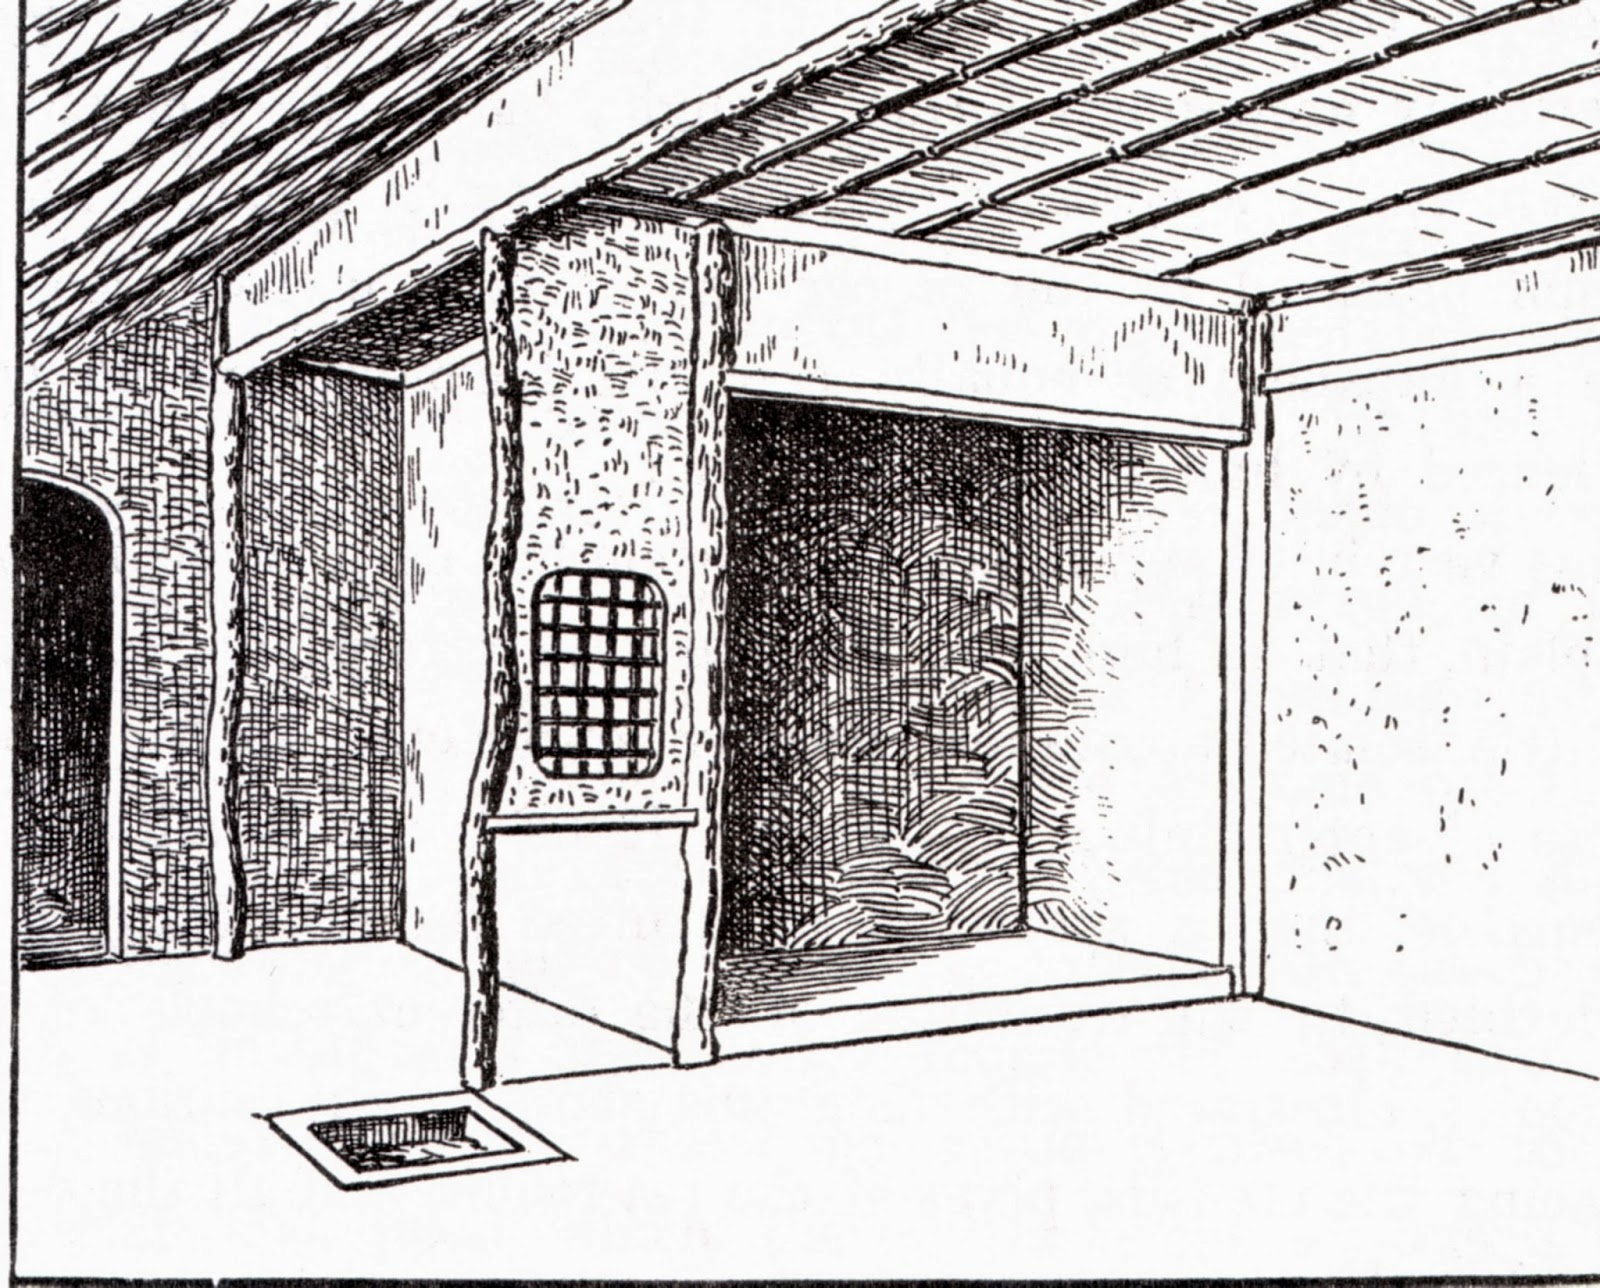 intérieur de pavillon de thé, Sen no rikyu